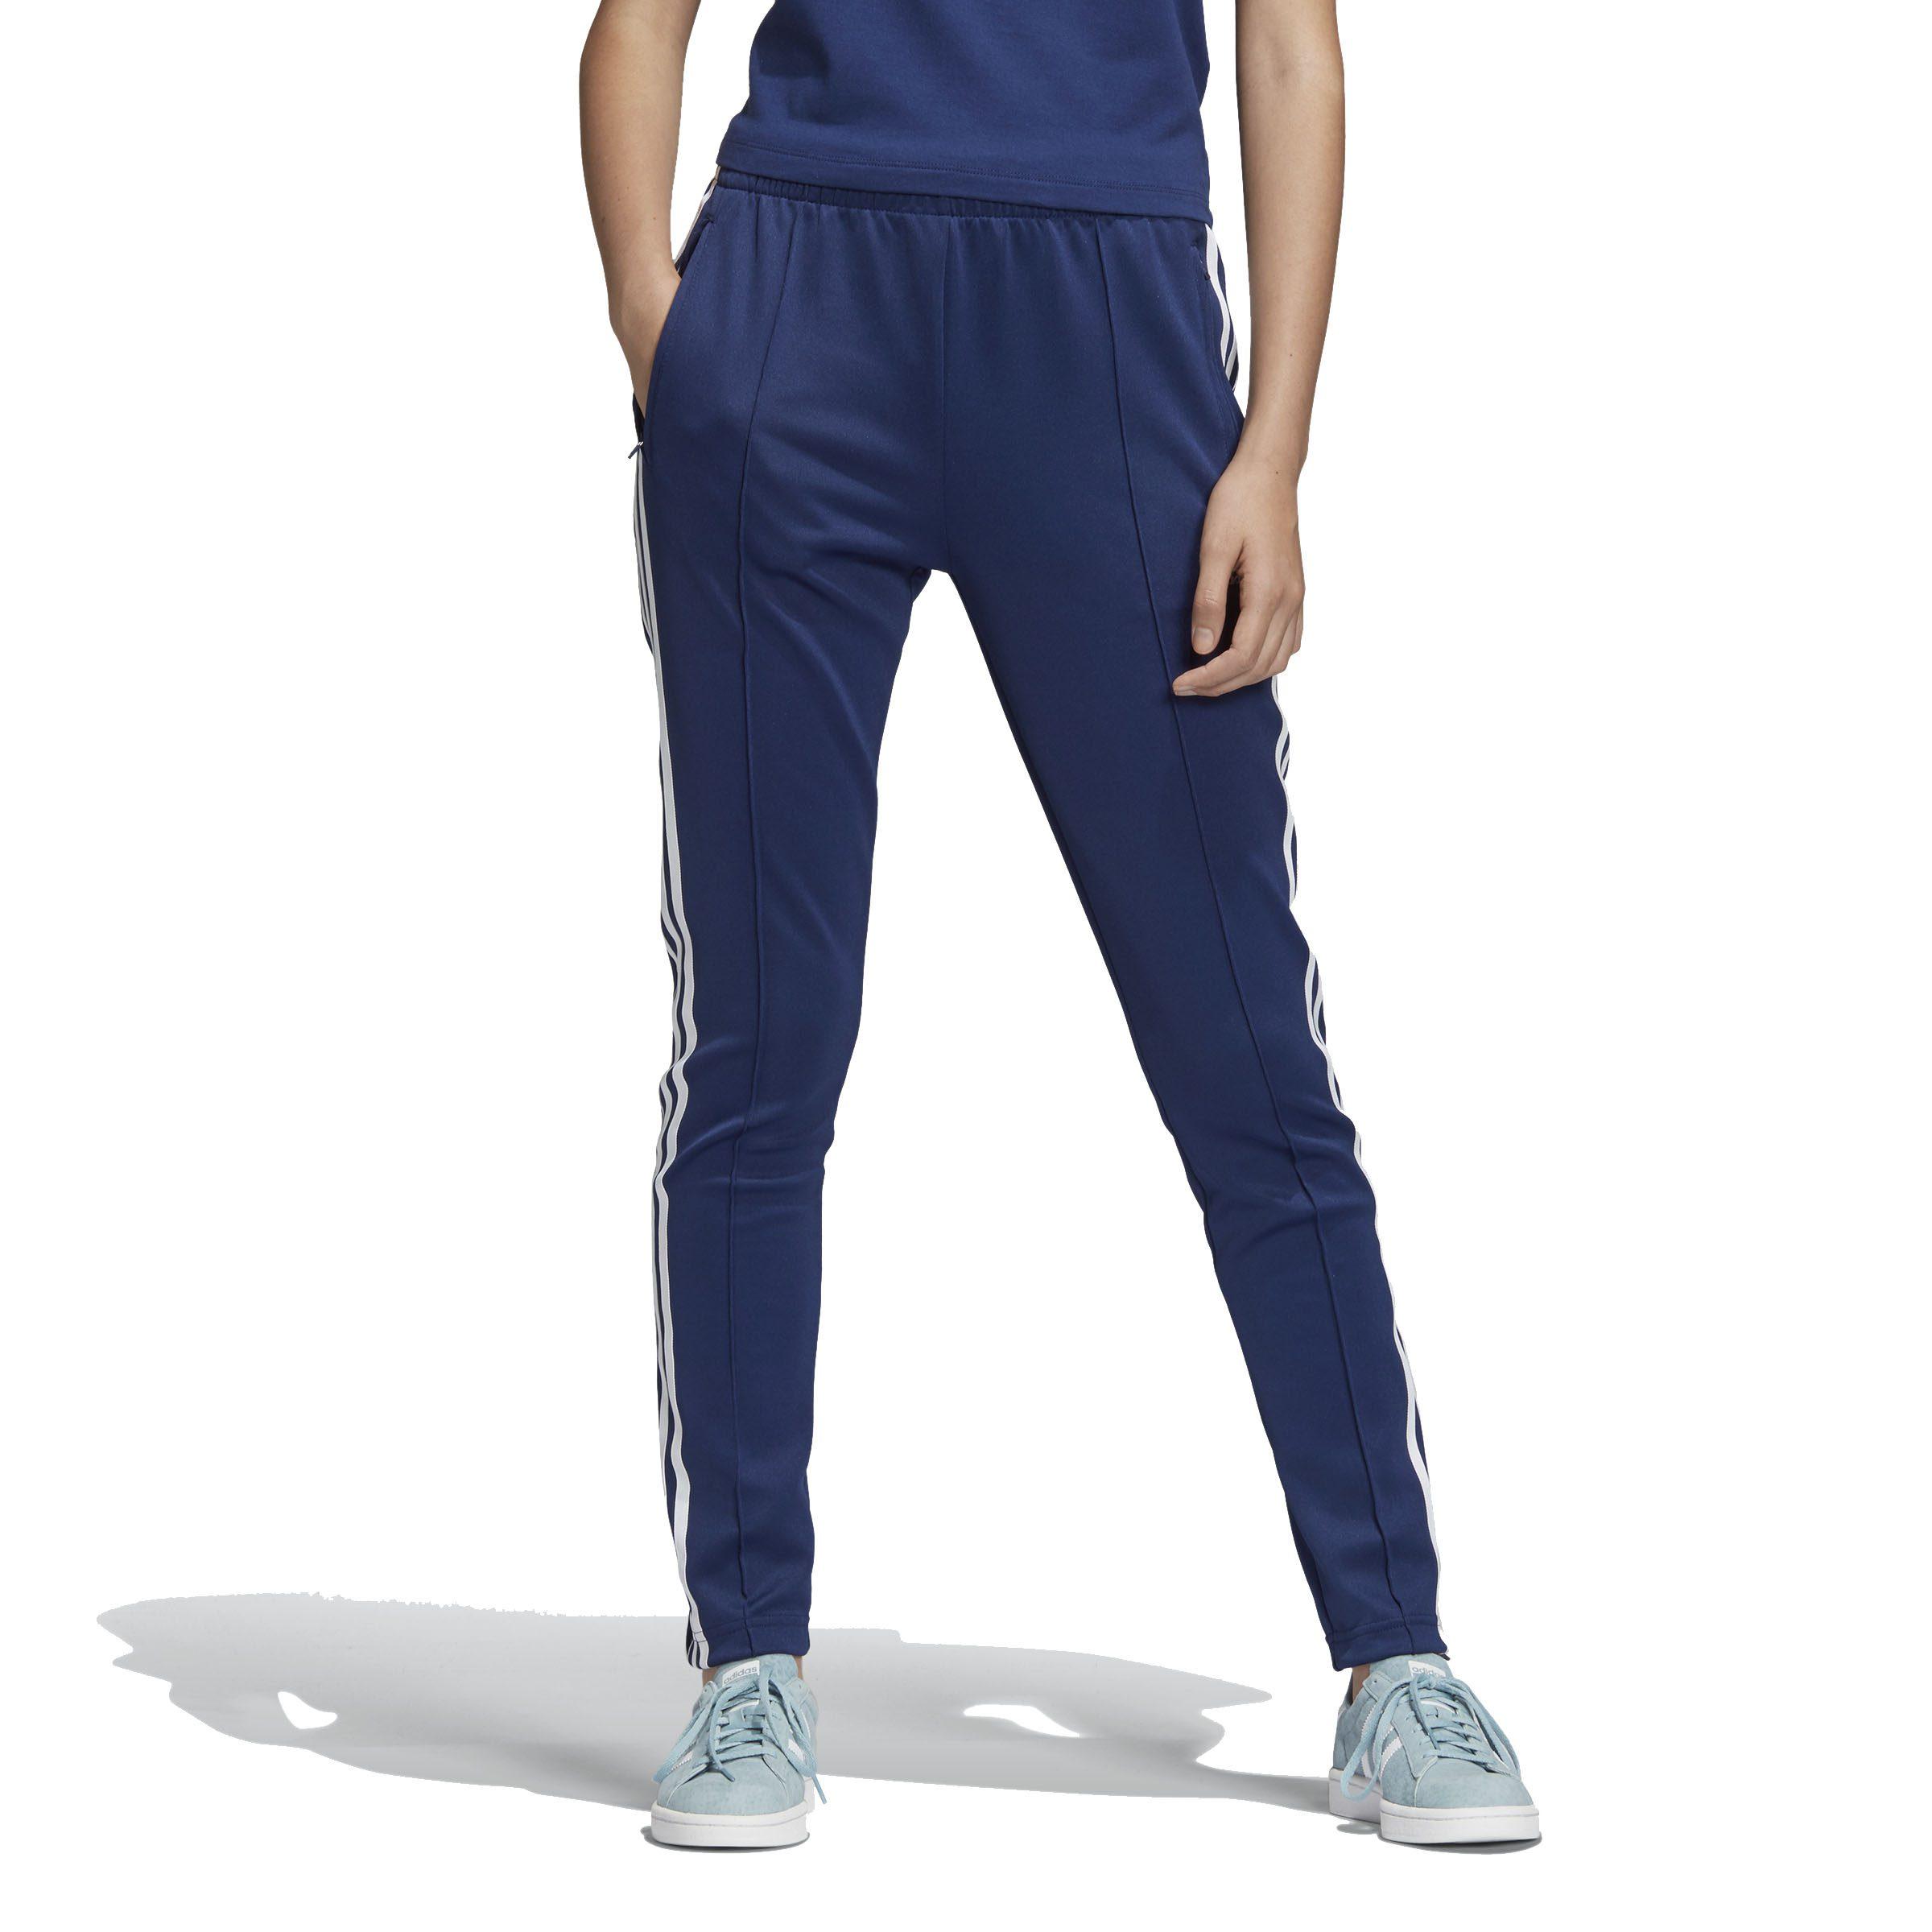 Adidas Originals Women S Sst Track Pants Dark Blue Dv2639 New Ebay